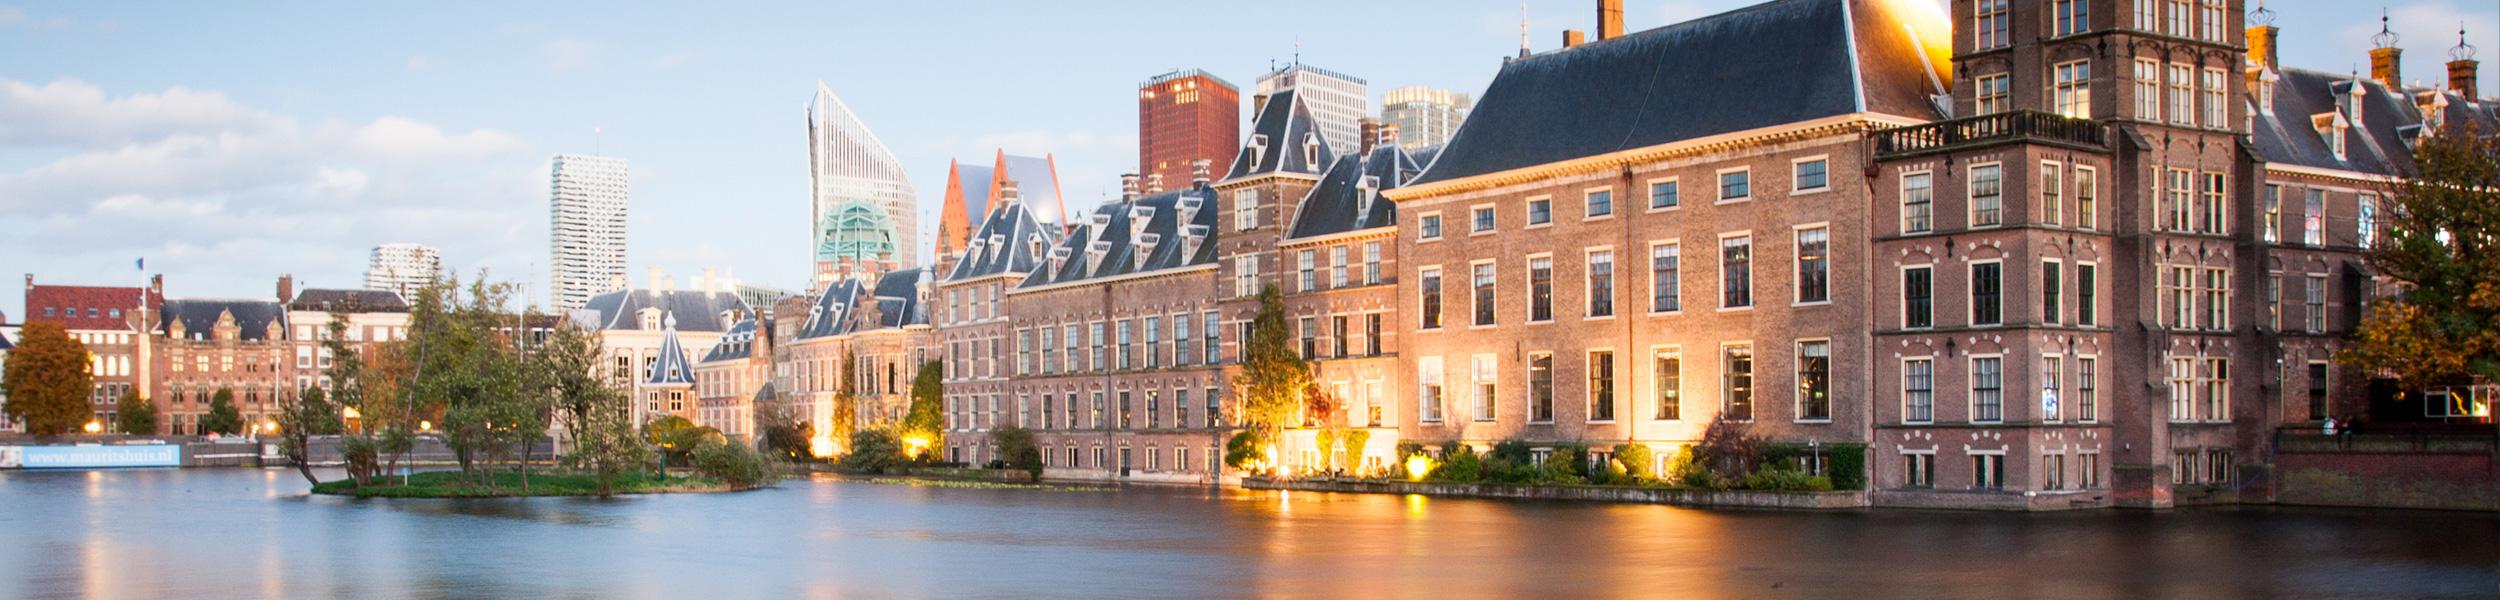 Senior C#/.NET Developer Den Hague, the Netherlands